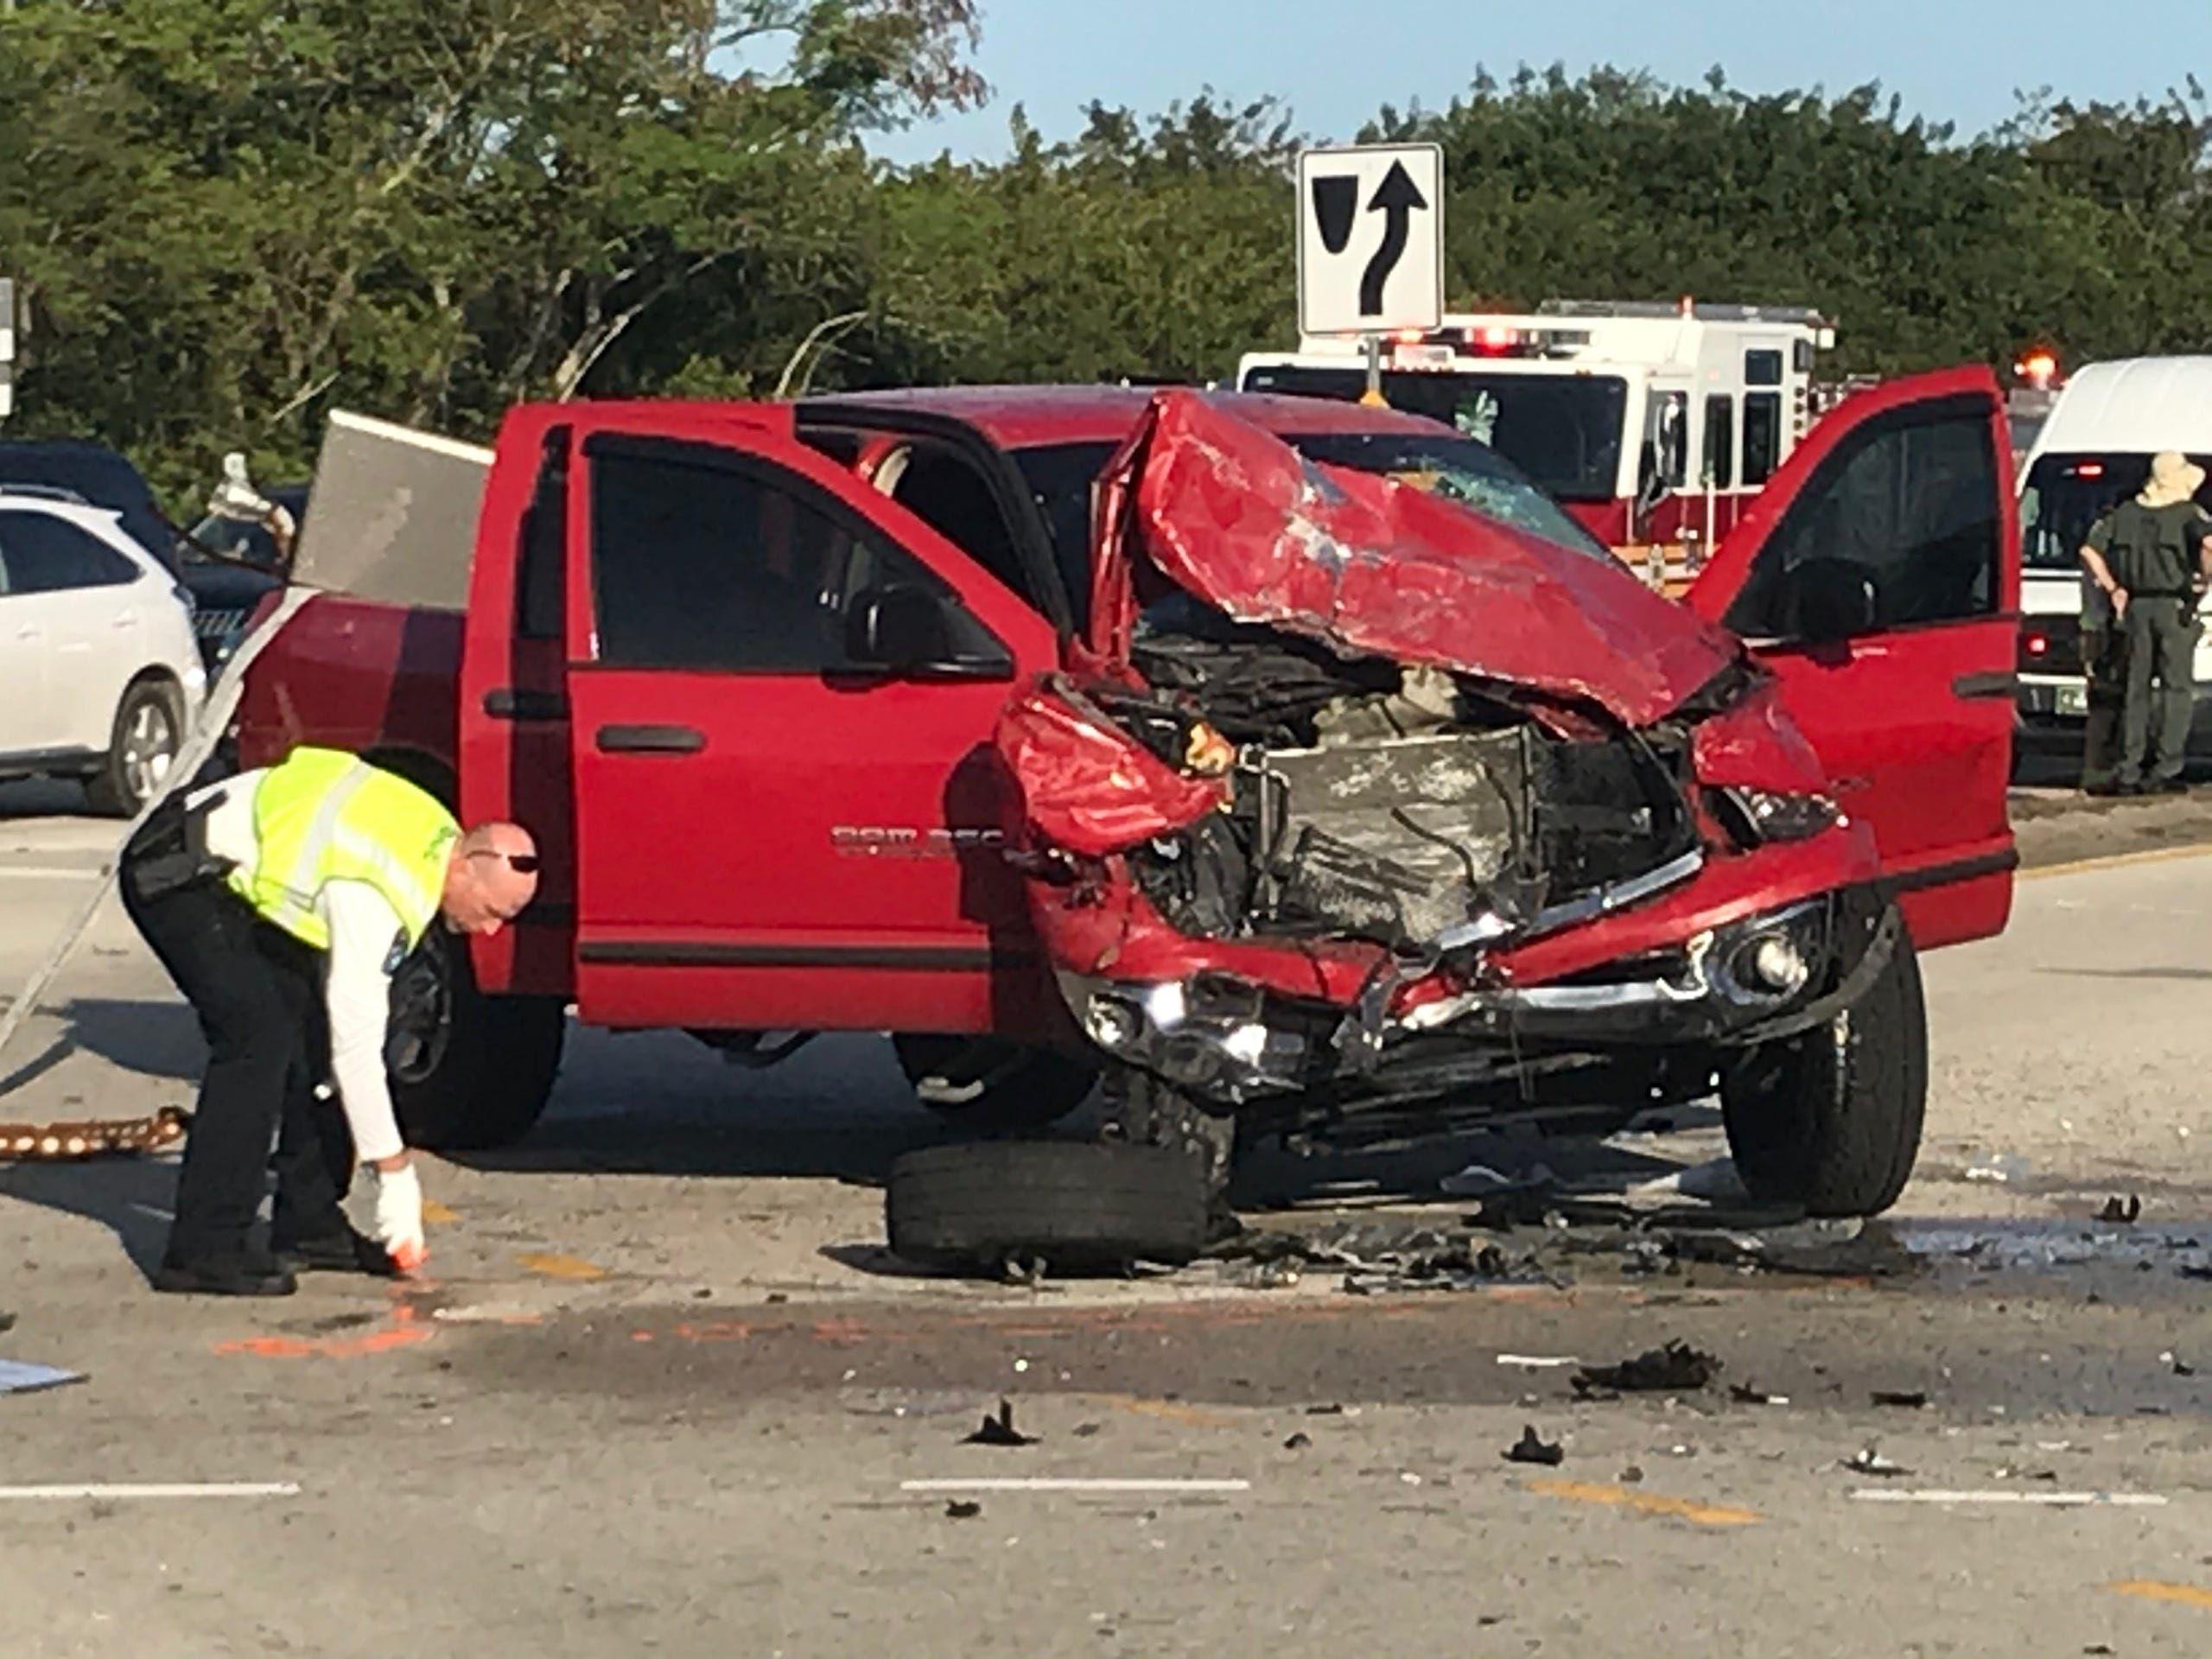 20yearold woman dies several injured in crash involving